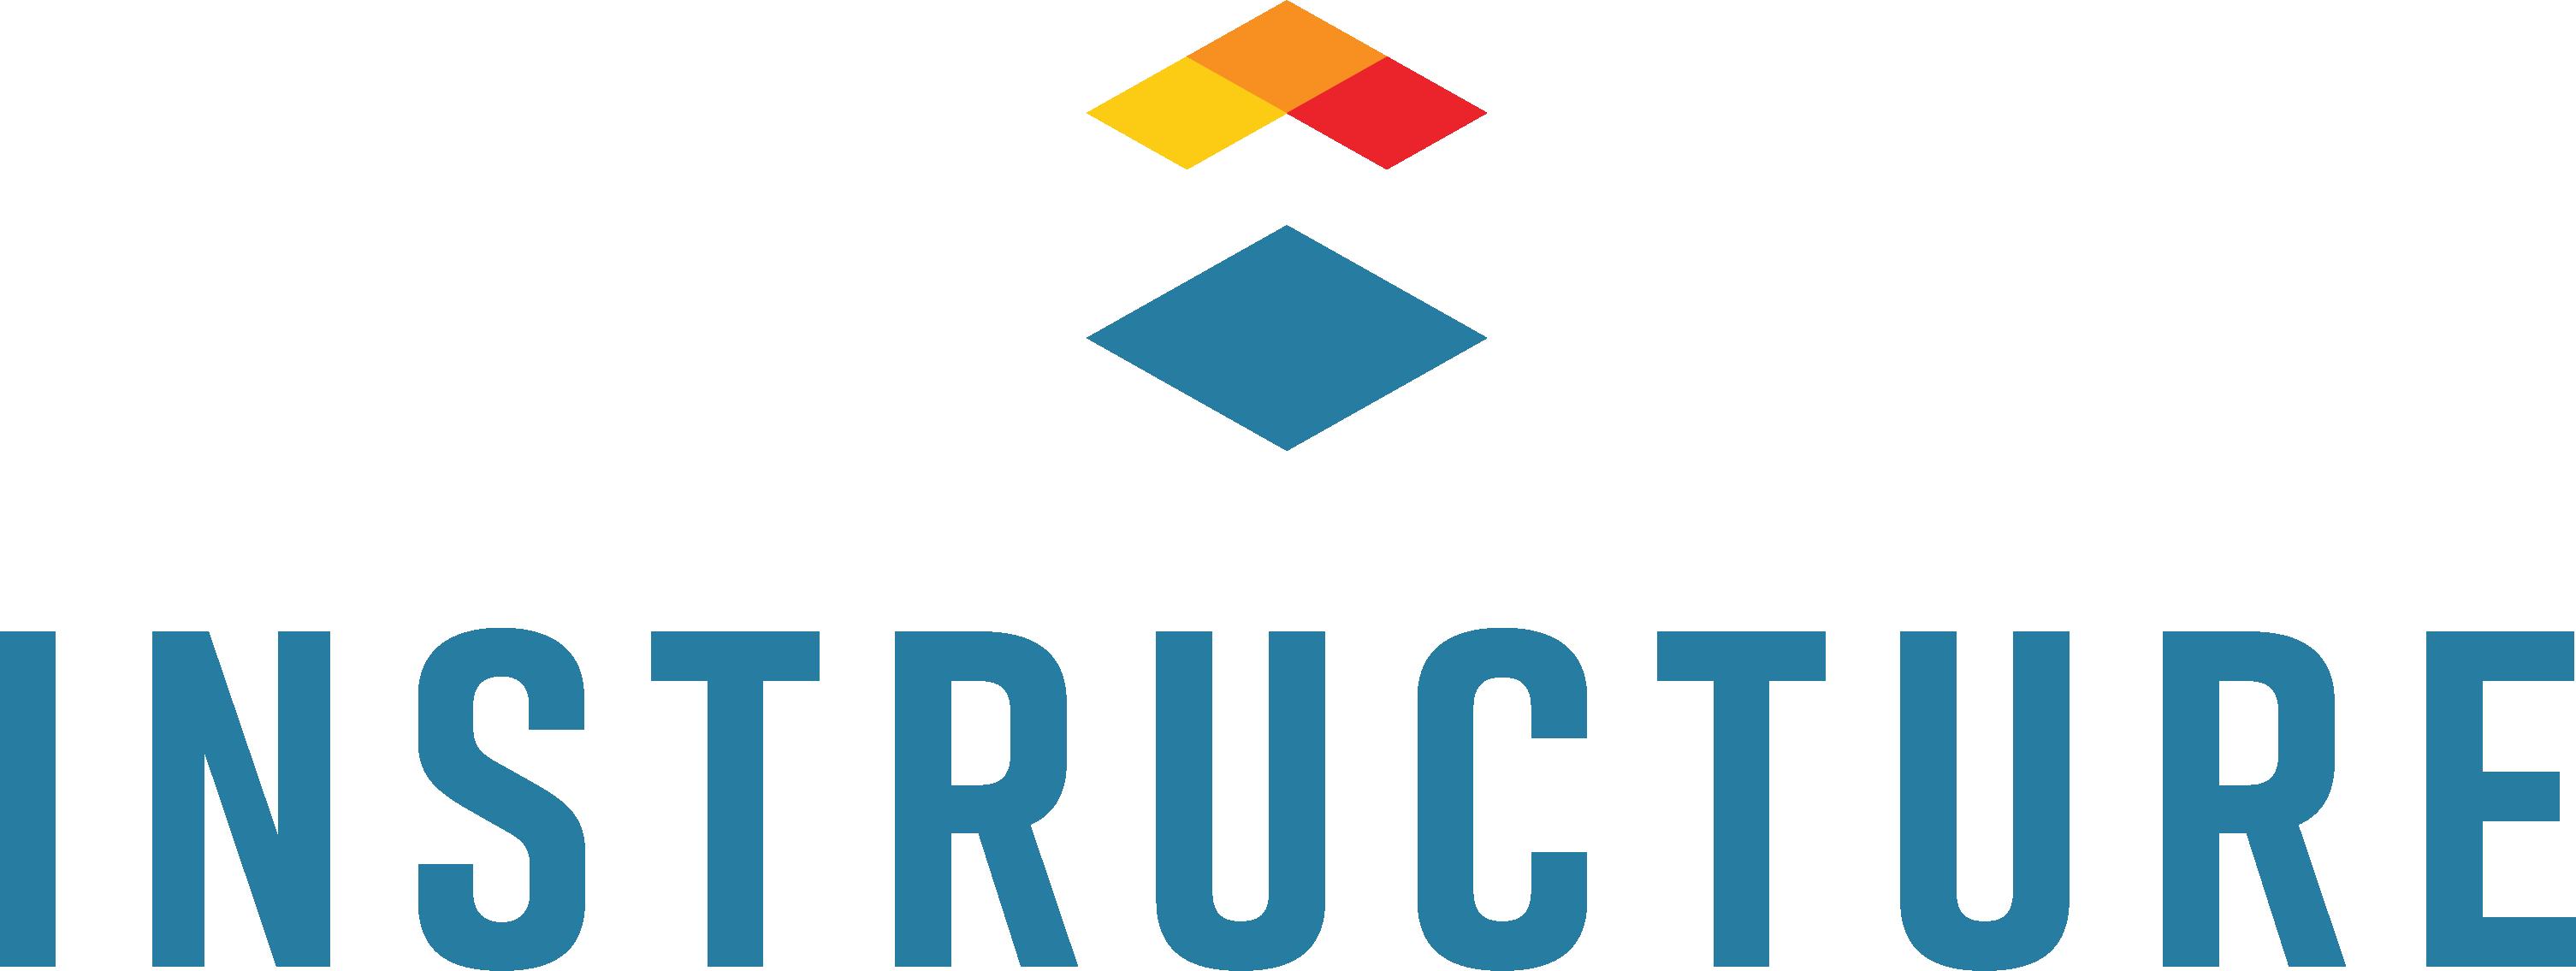 Instructure Company Logo